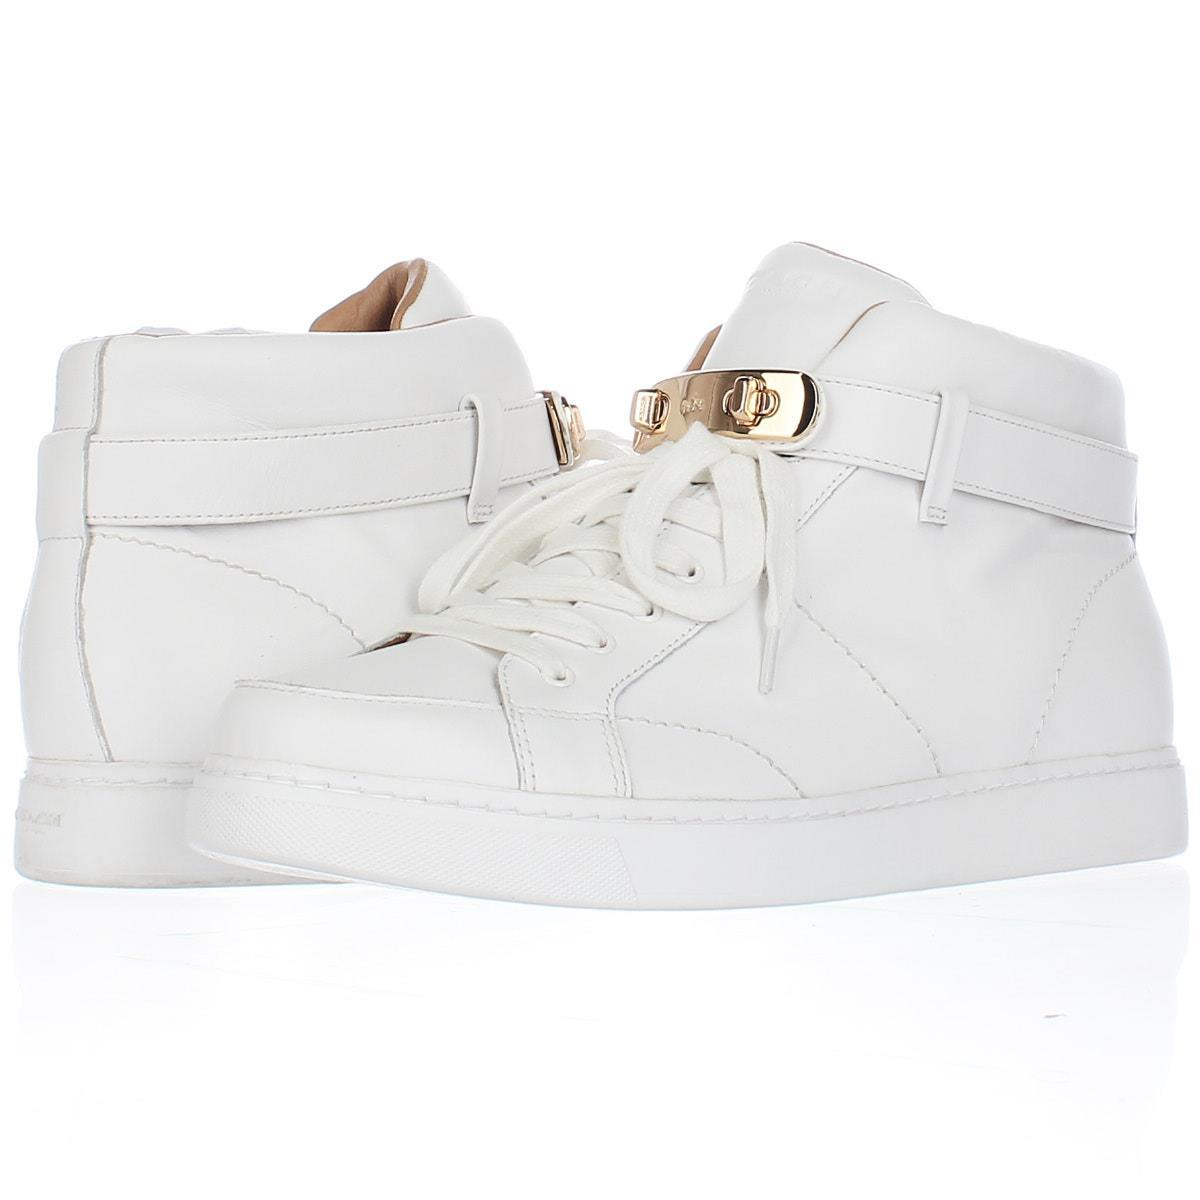 Fs 22461 coach richmond fleece lined high top fashion sneakers white 1